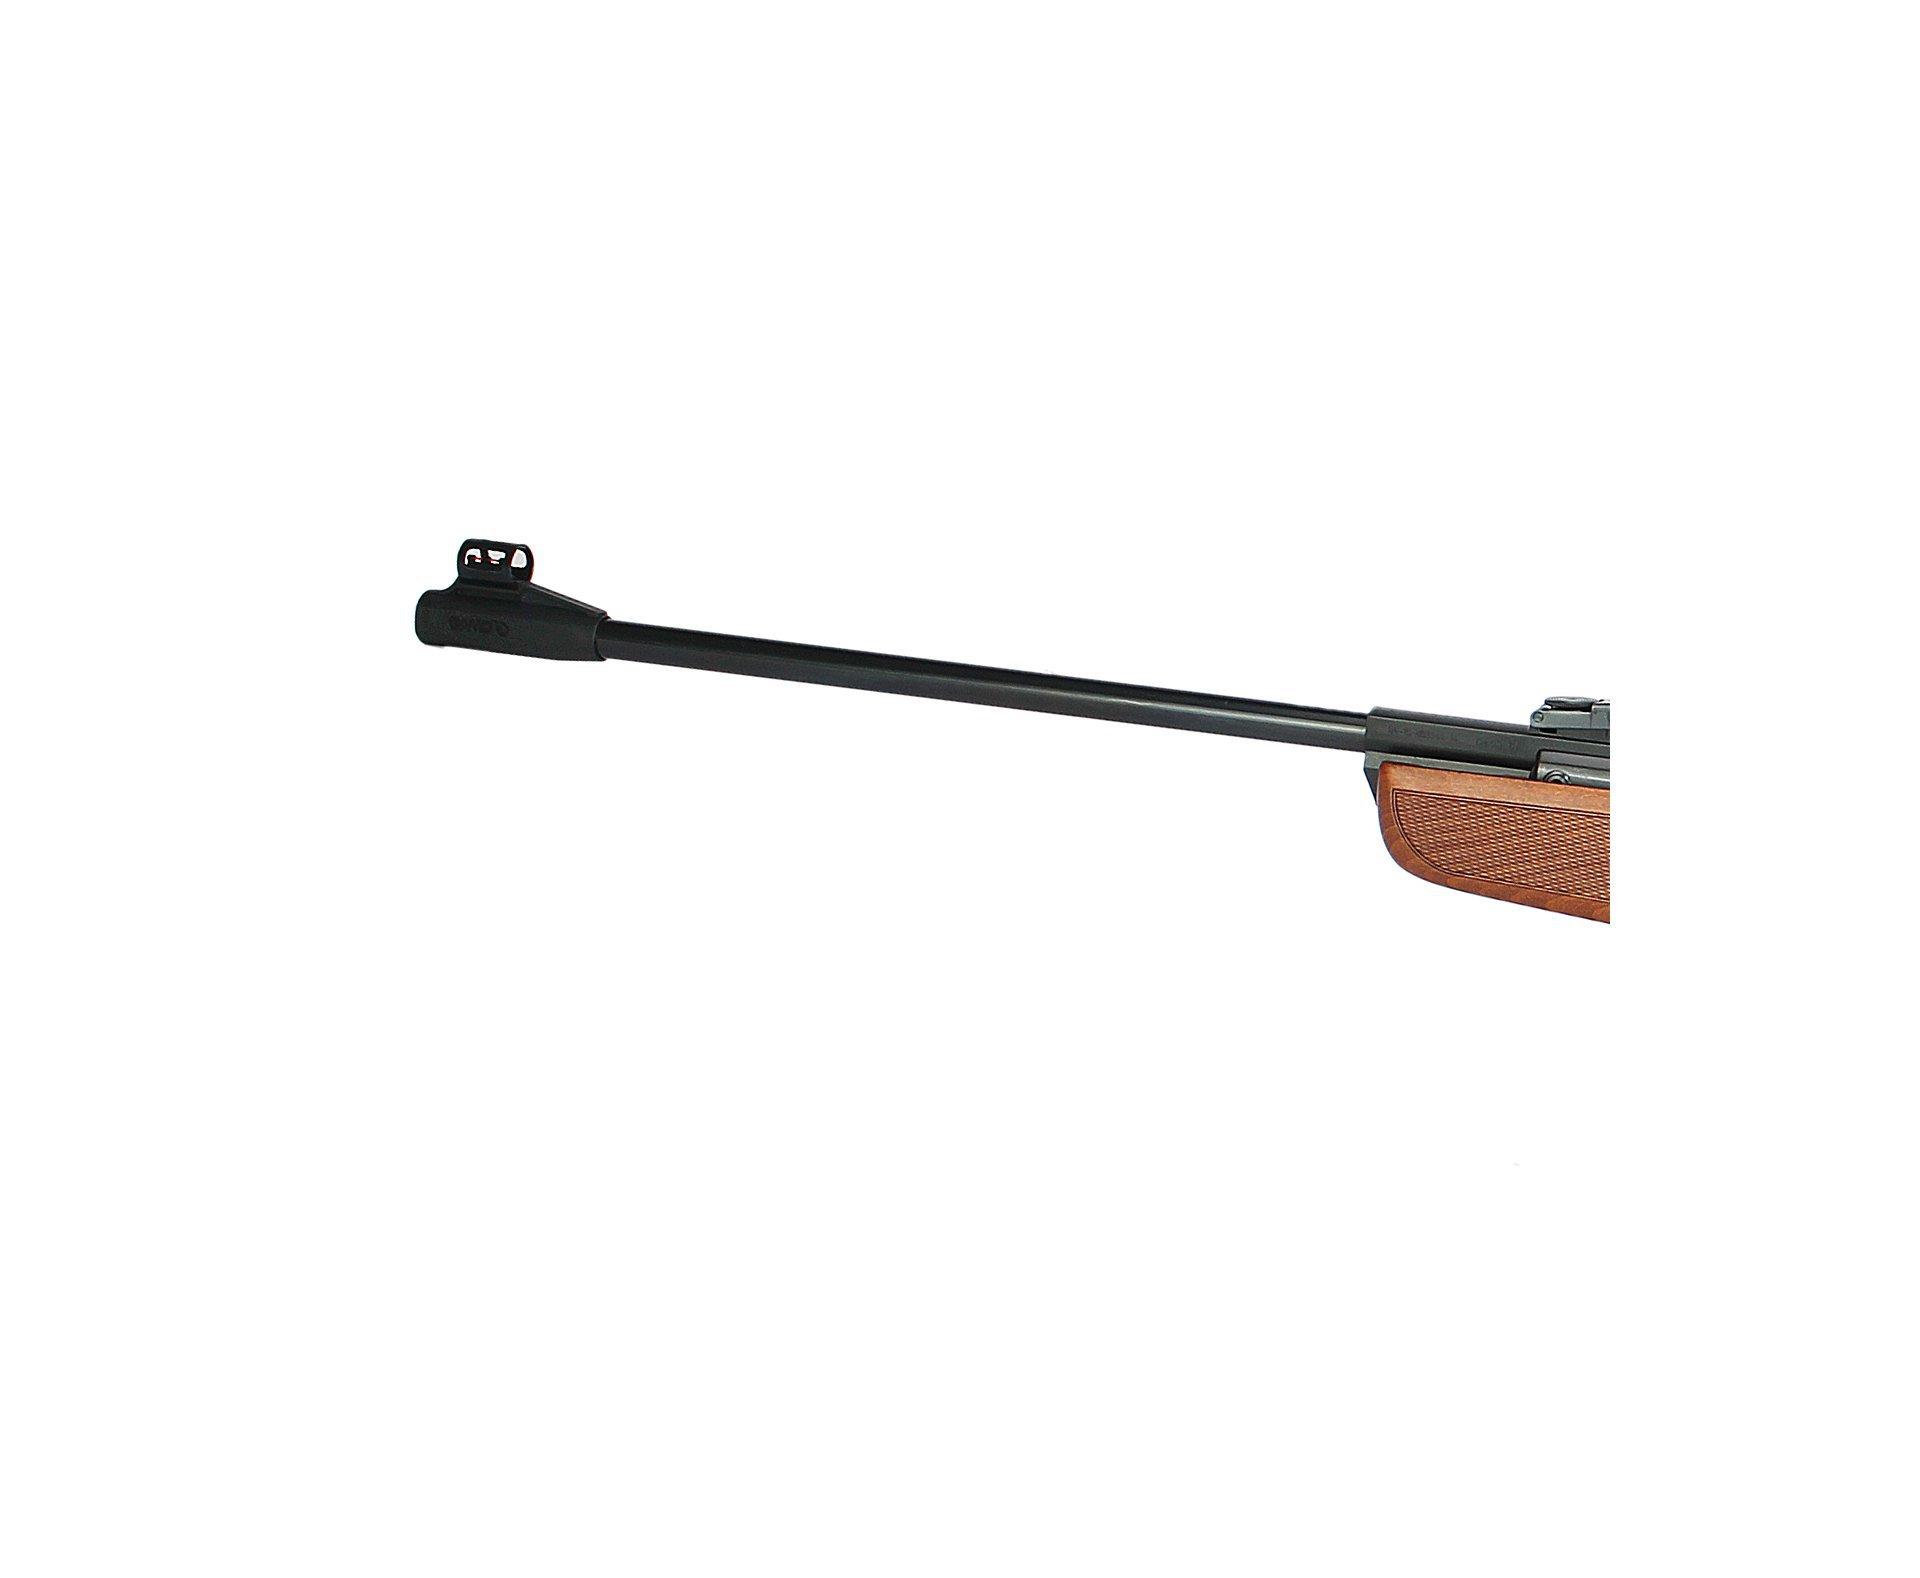 Carabina De Pressão Gamo Hunter Igt - Calibre 5,5 Mm